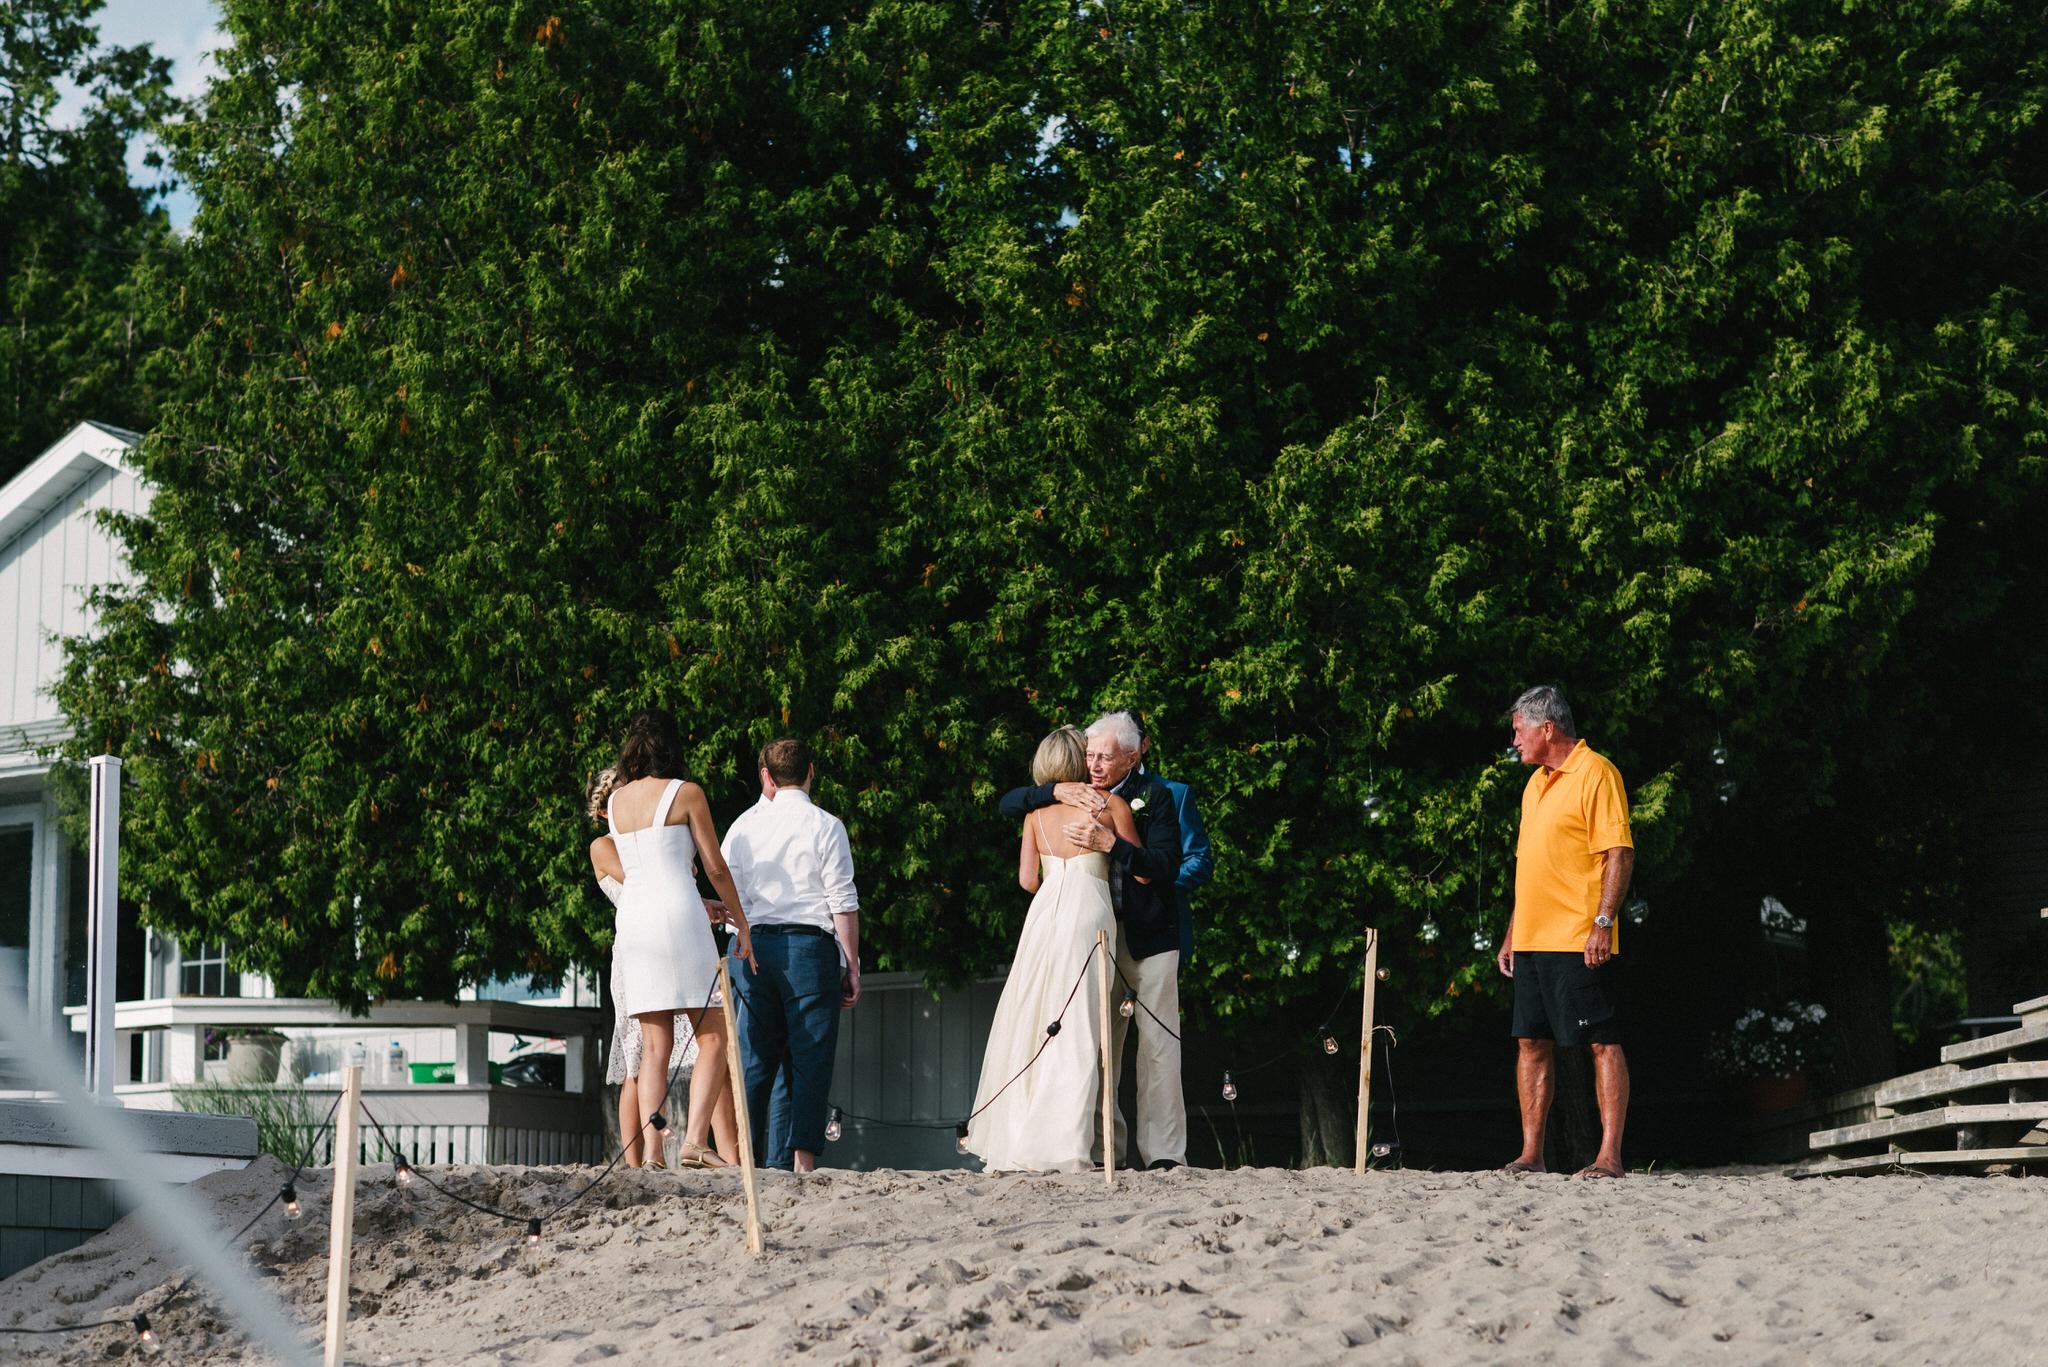 toronto wedding photography scarlet oneill135.JPG